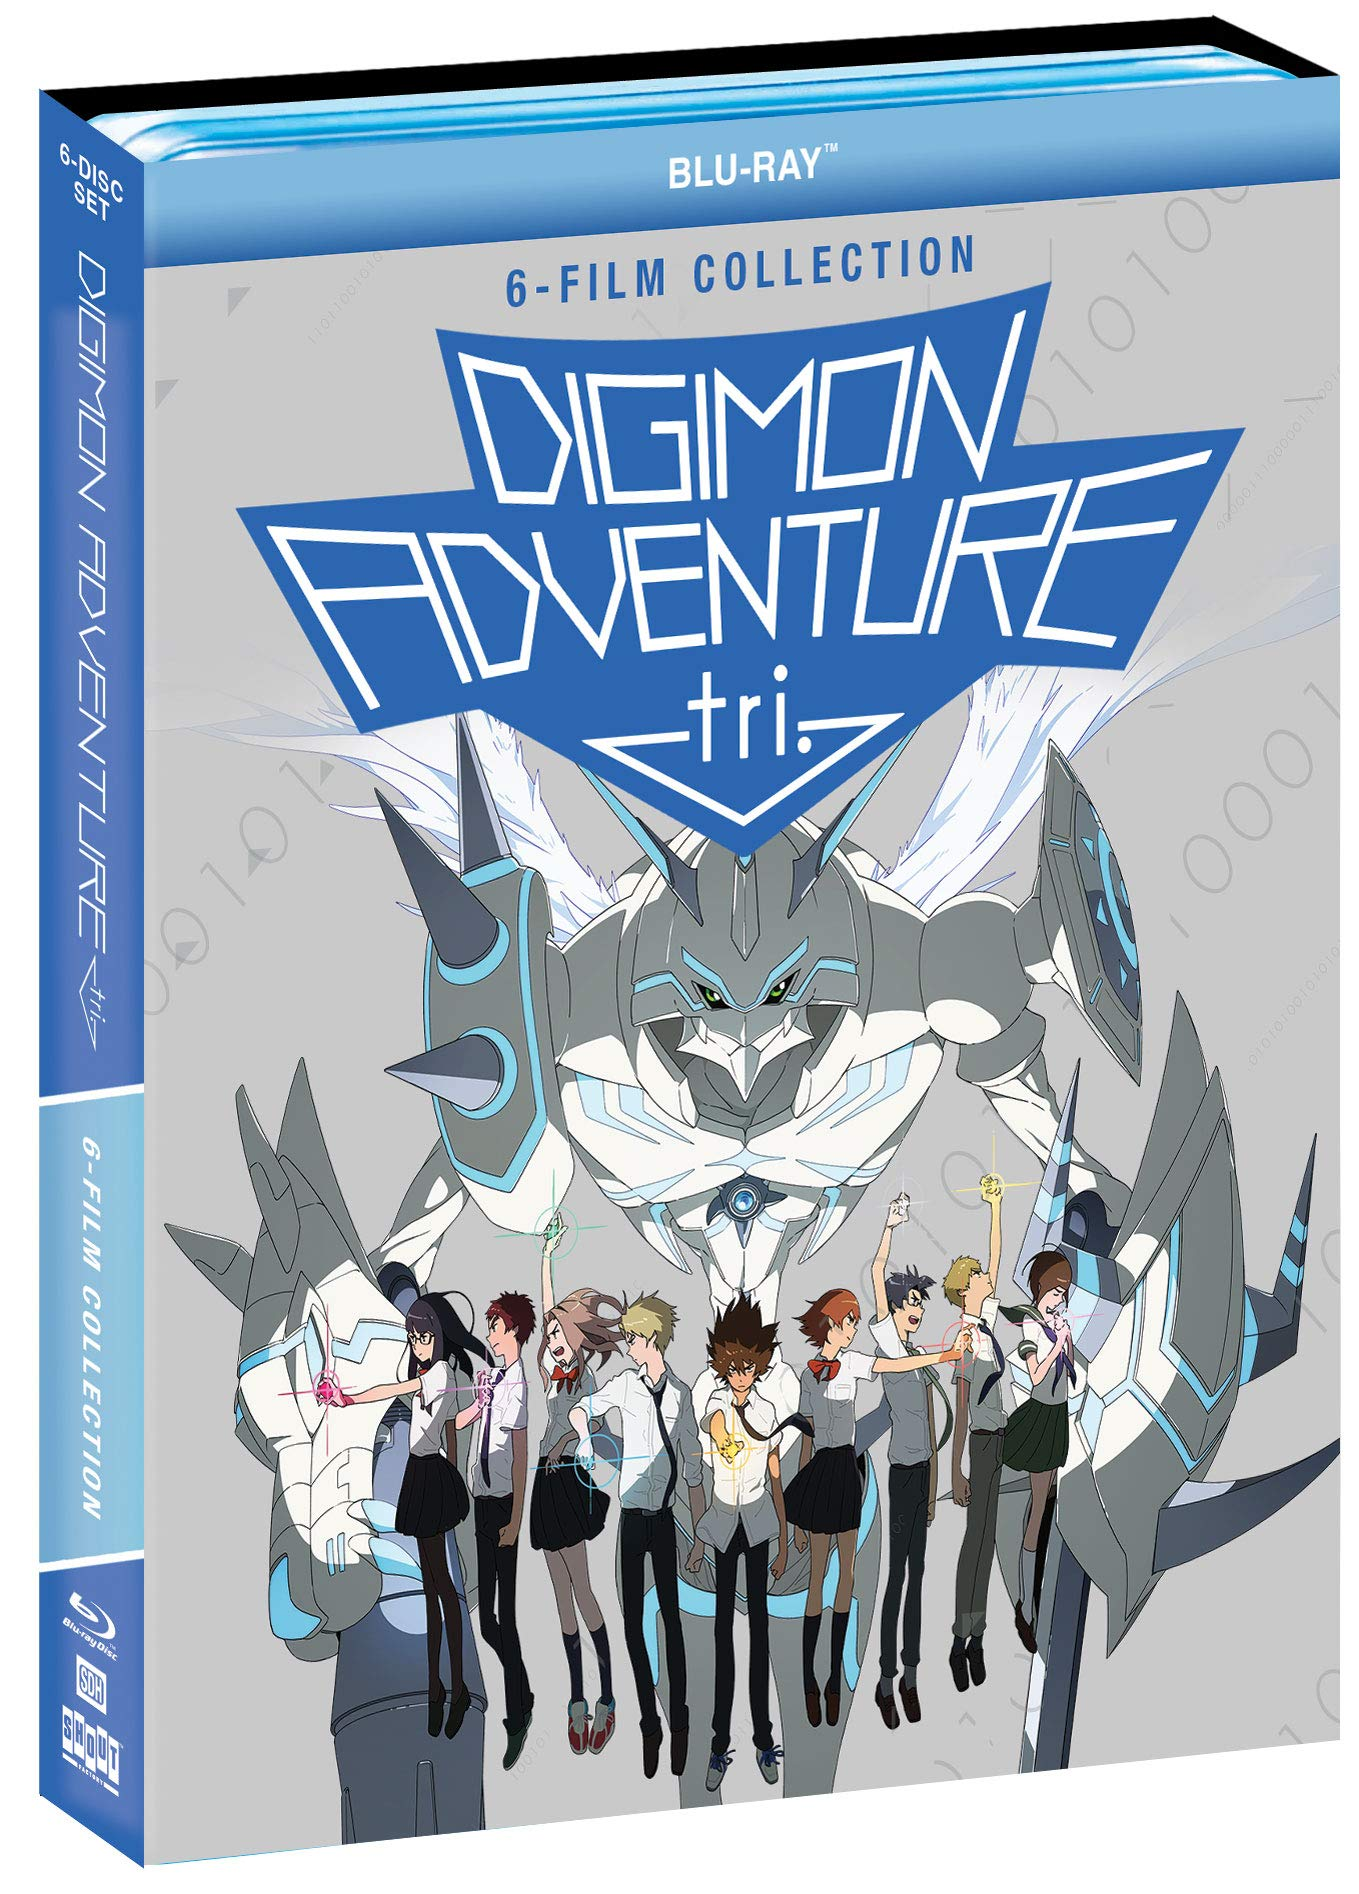 Digimon Adventure tri.: The Complete 6-Film Collection (Blu-ray)